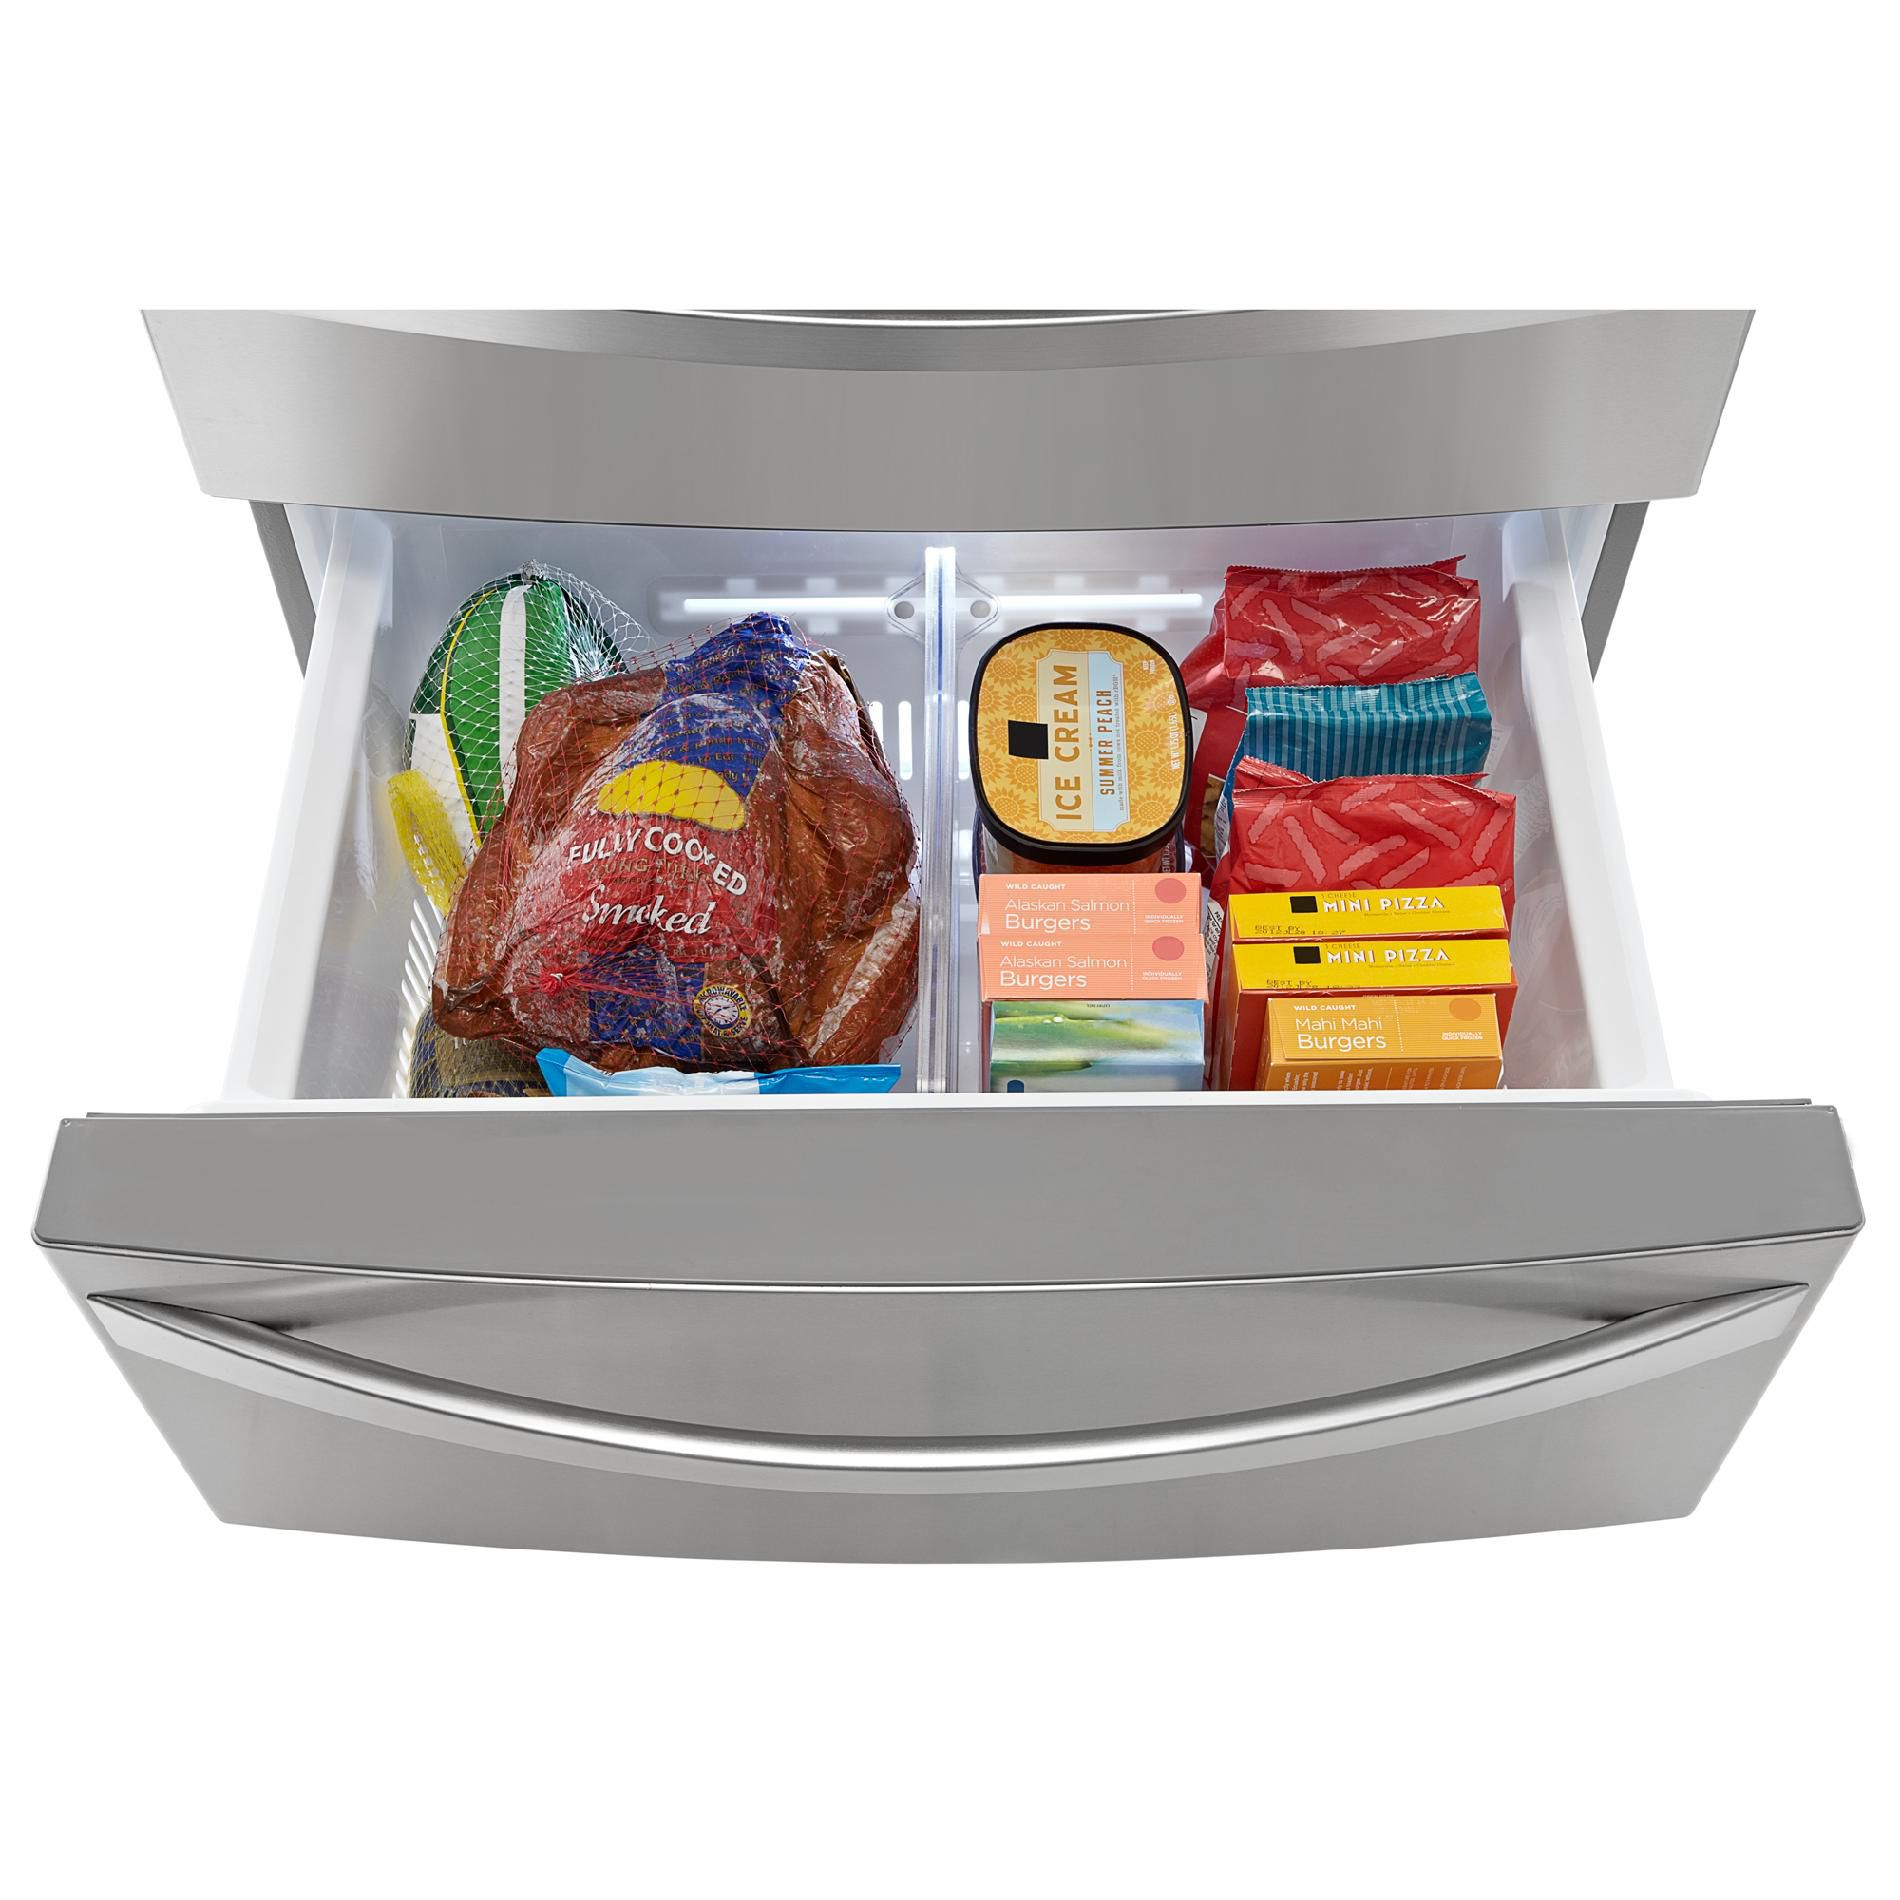 Kenmore Elite 31.0 cu. ft. Dual-Freezer French-Door Bottom-Freezer Refrigerator - Stainless Steel